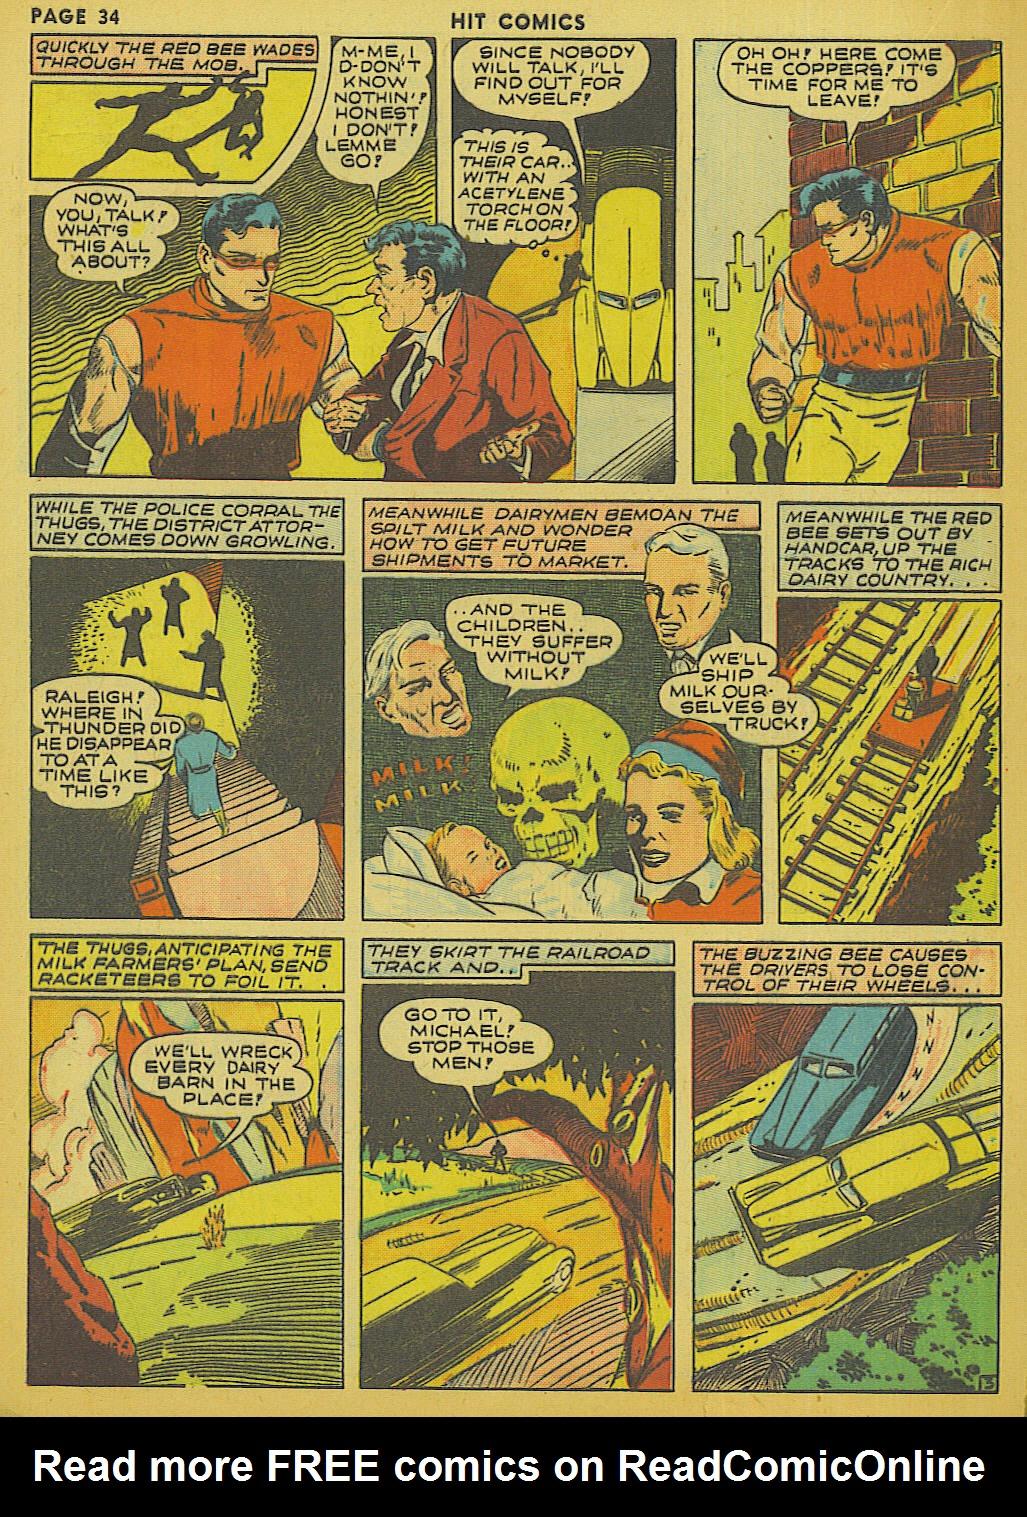 Read online Hit Comics comic -  Issue #13 - 36